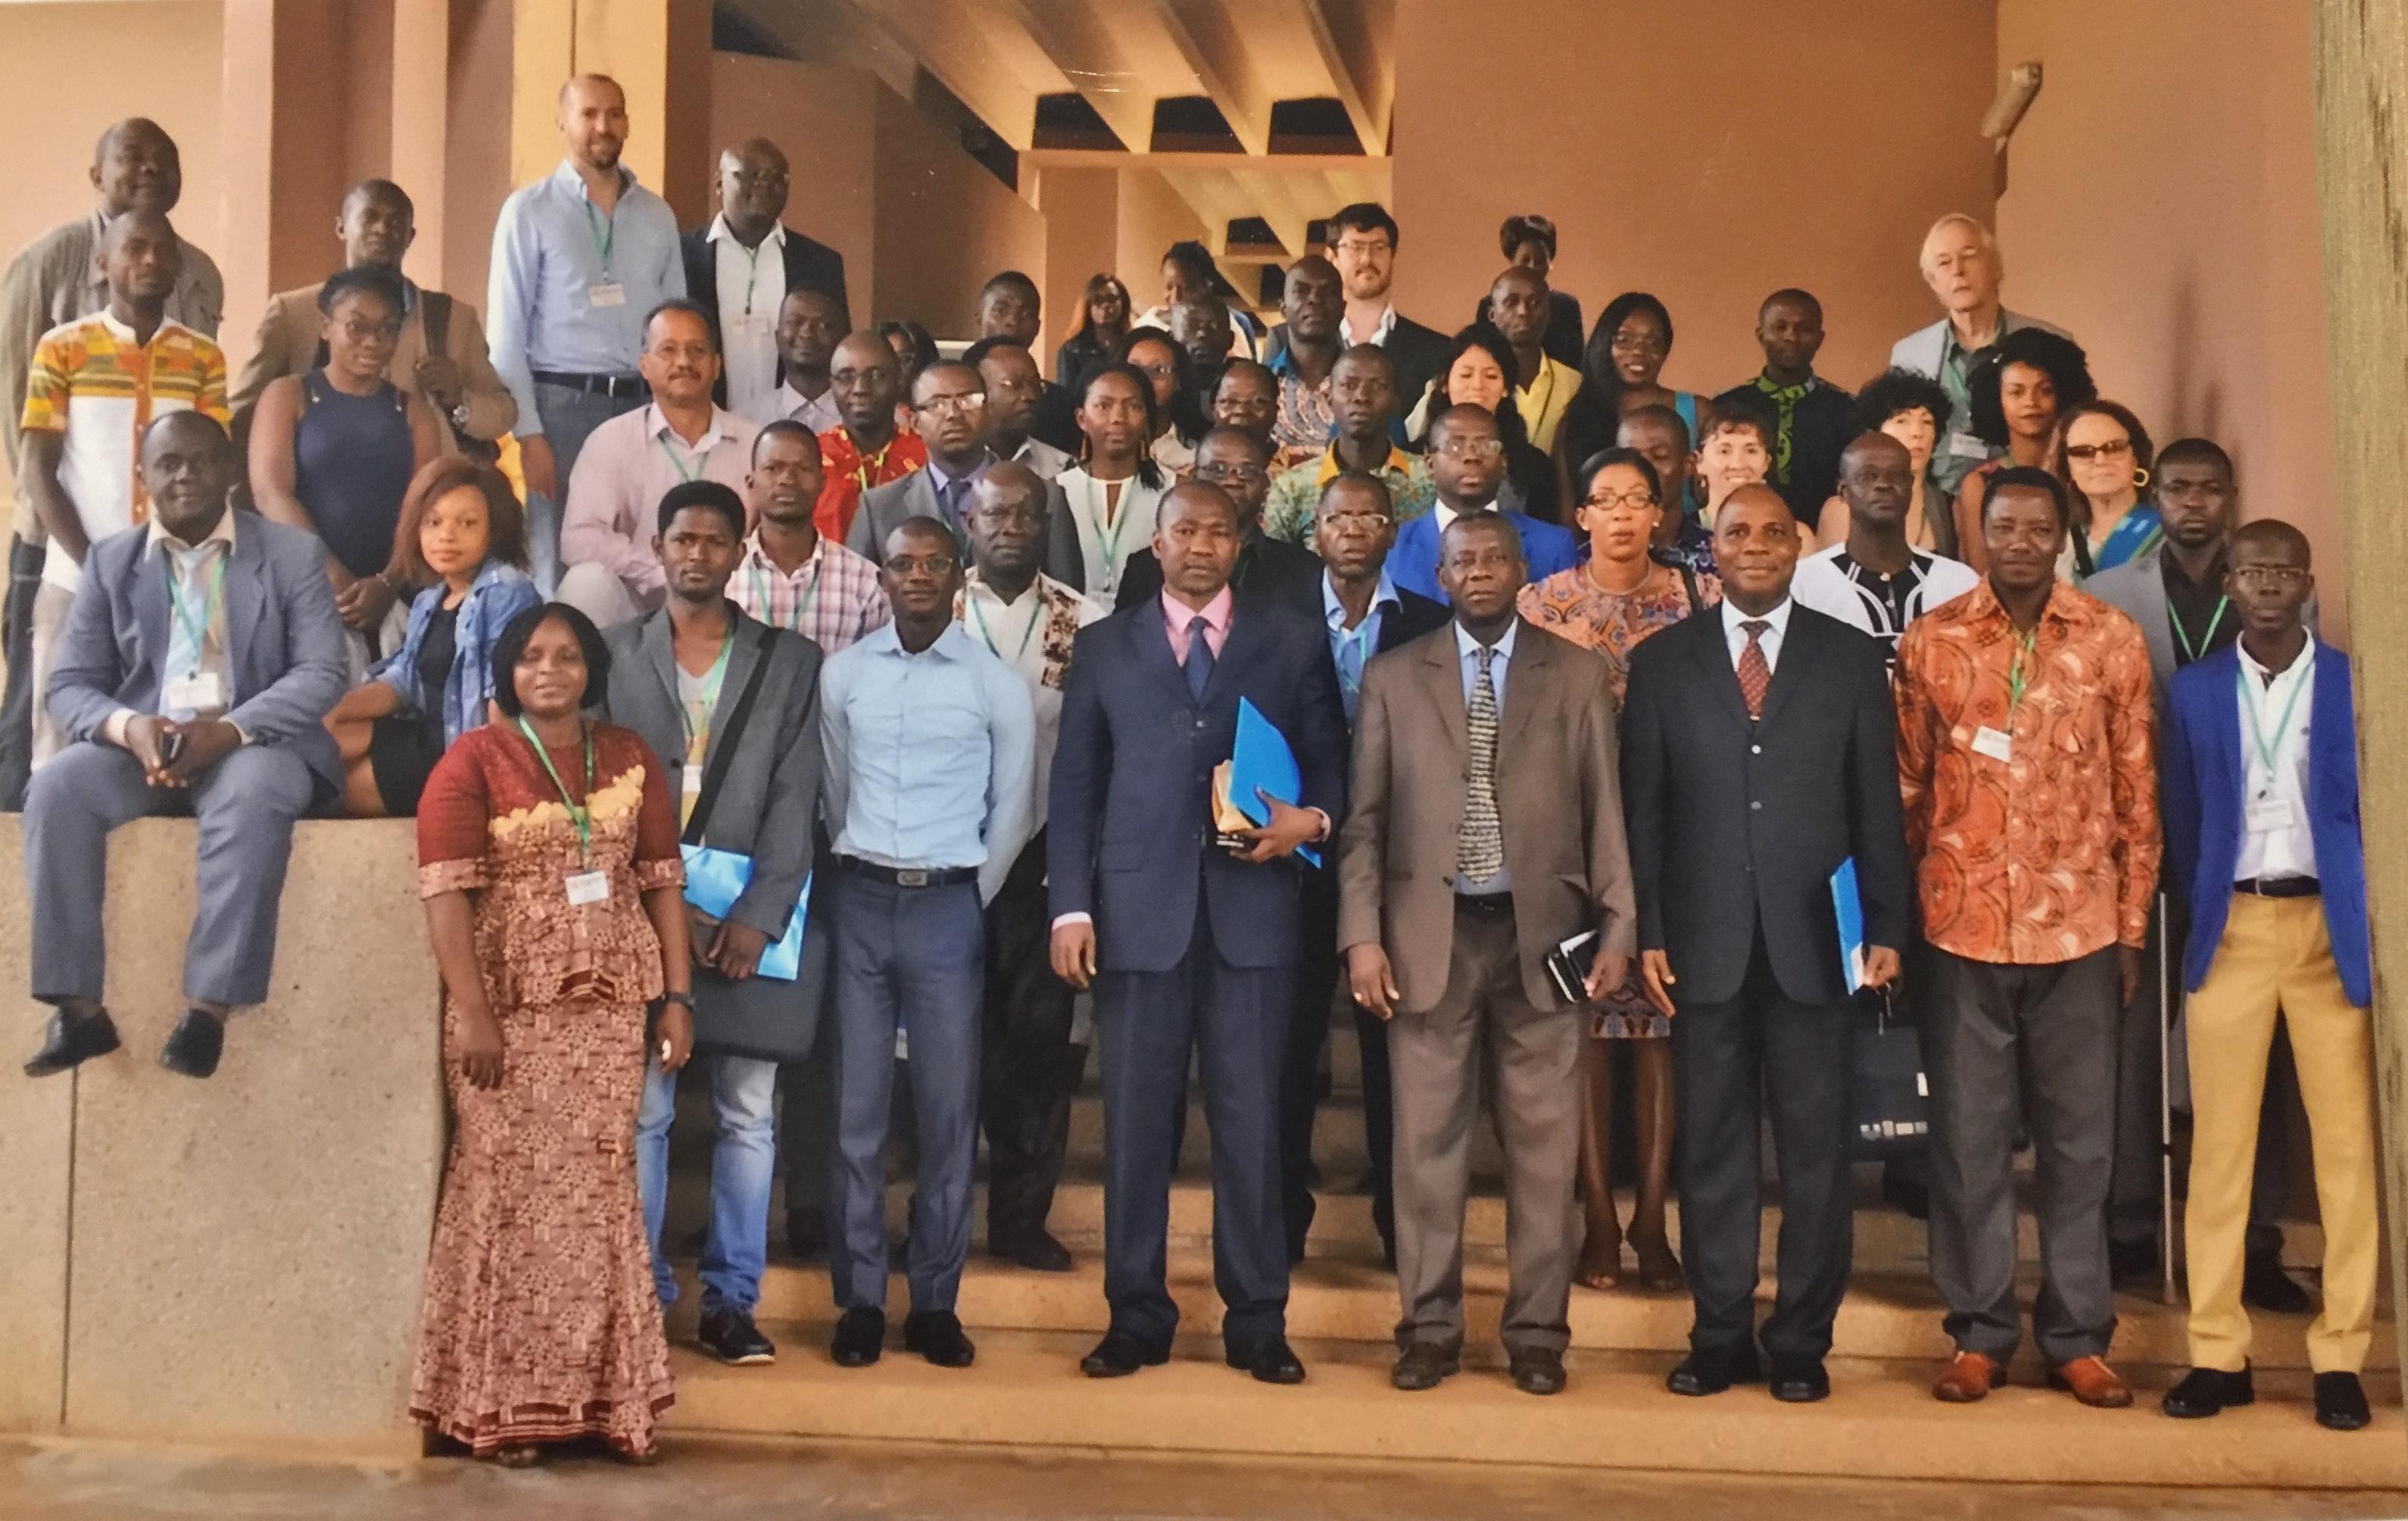 Congrès d'Abidjan 2017 - pane-listes